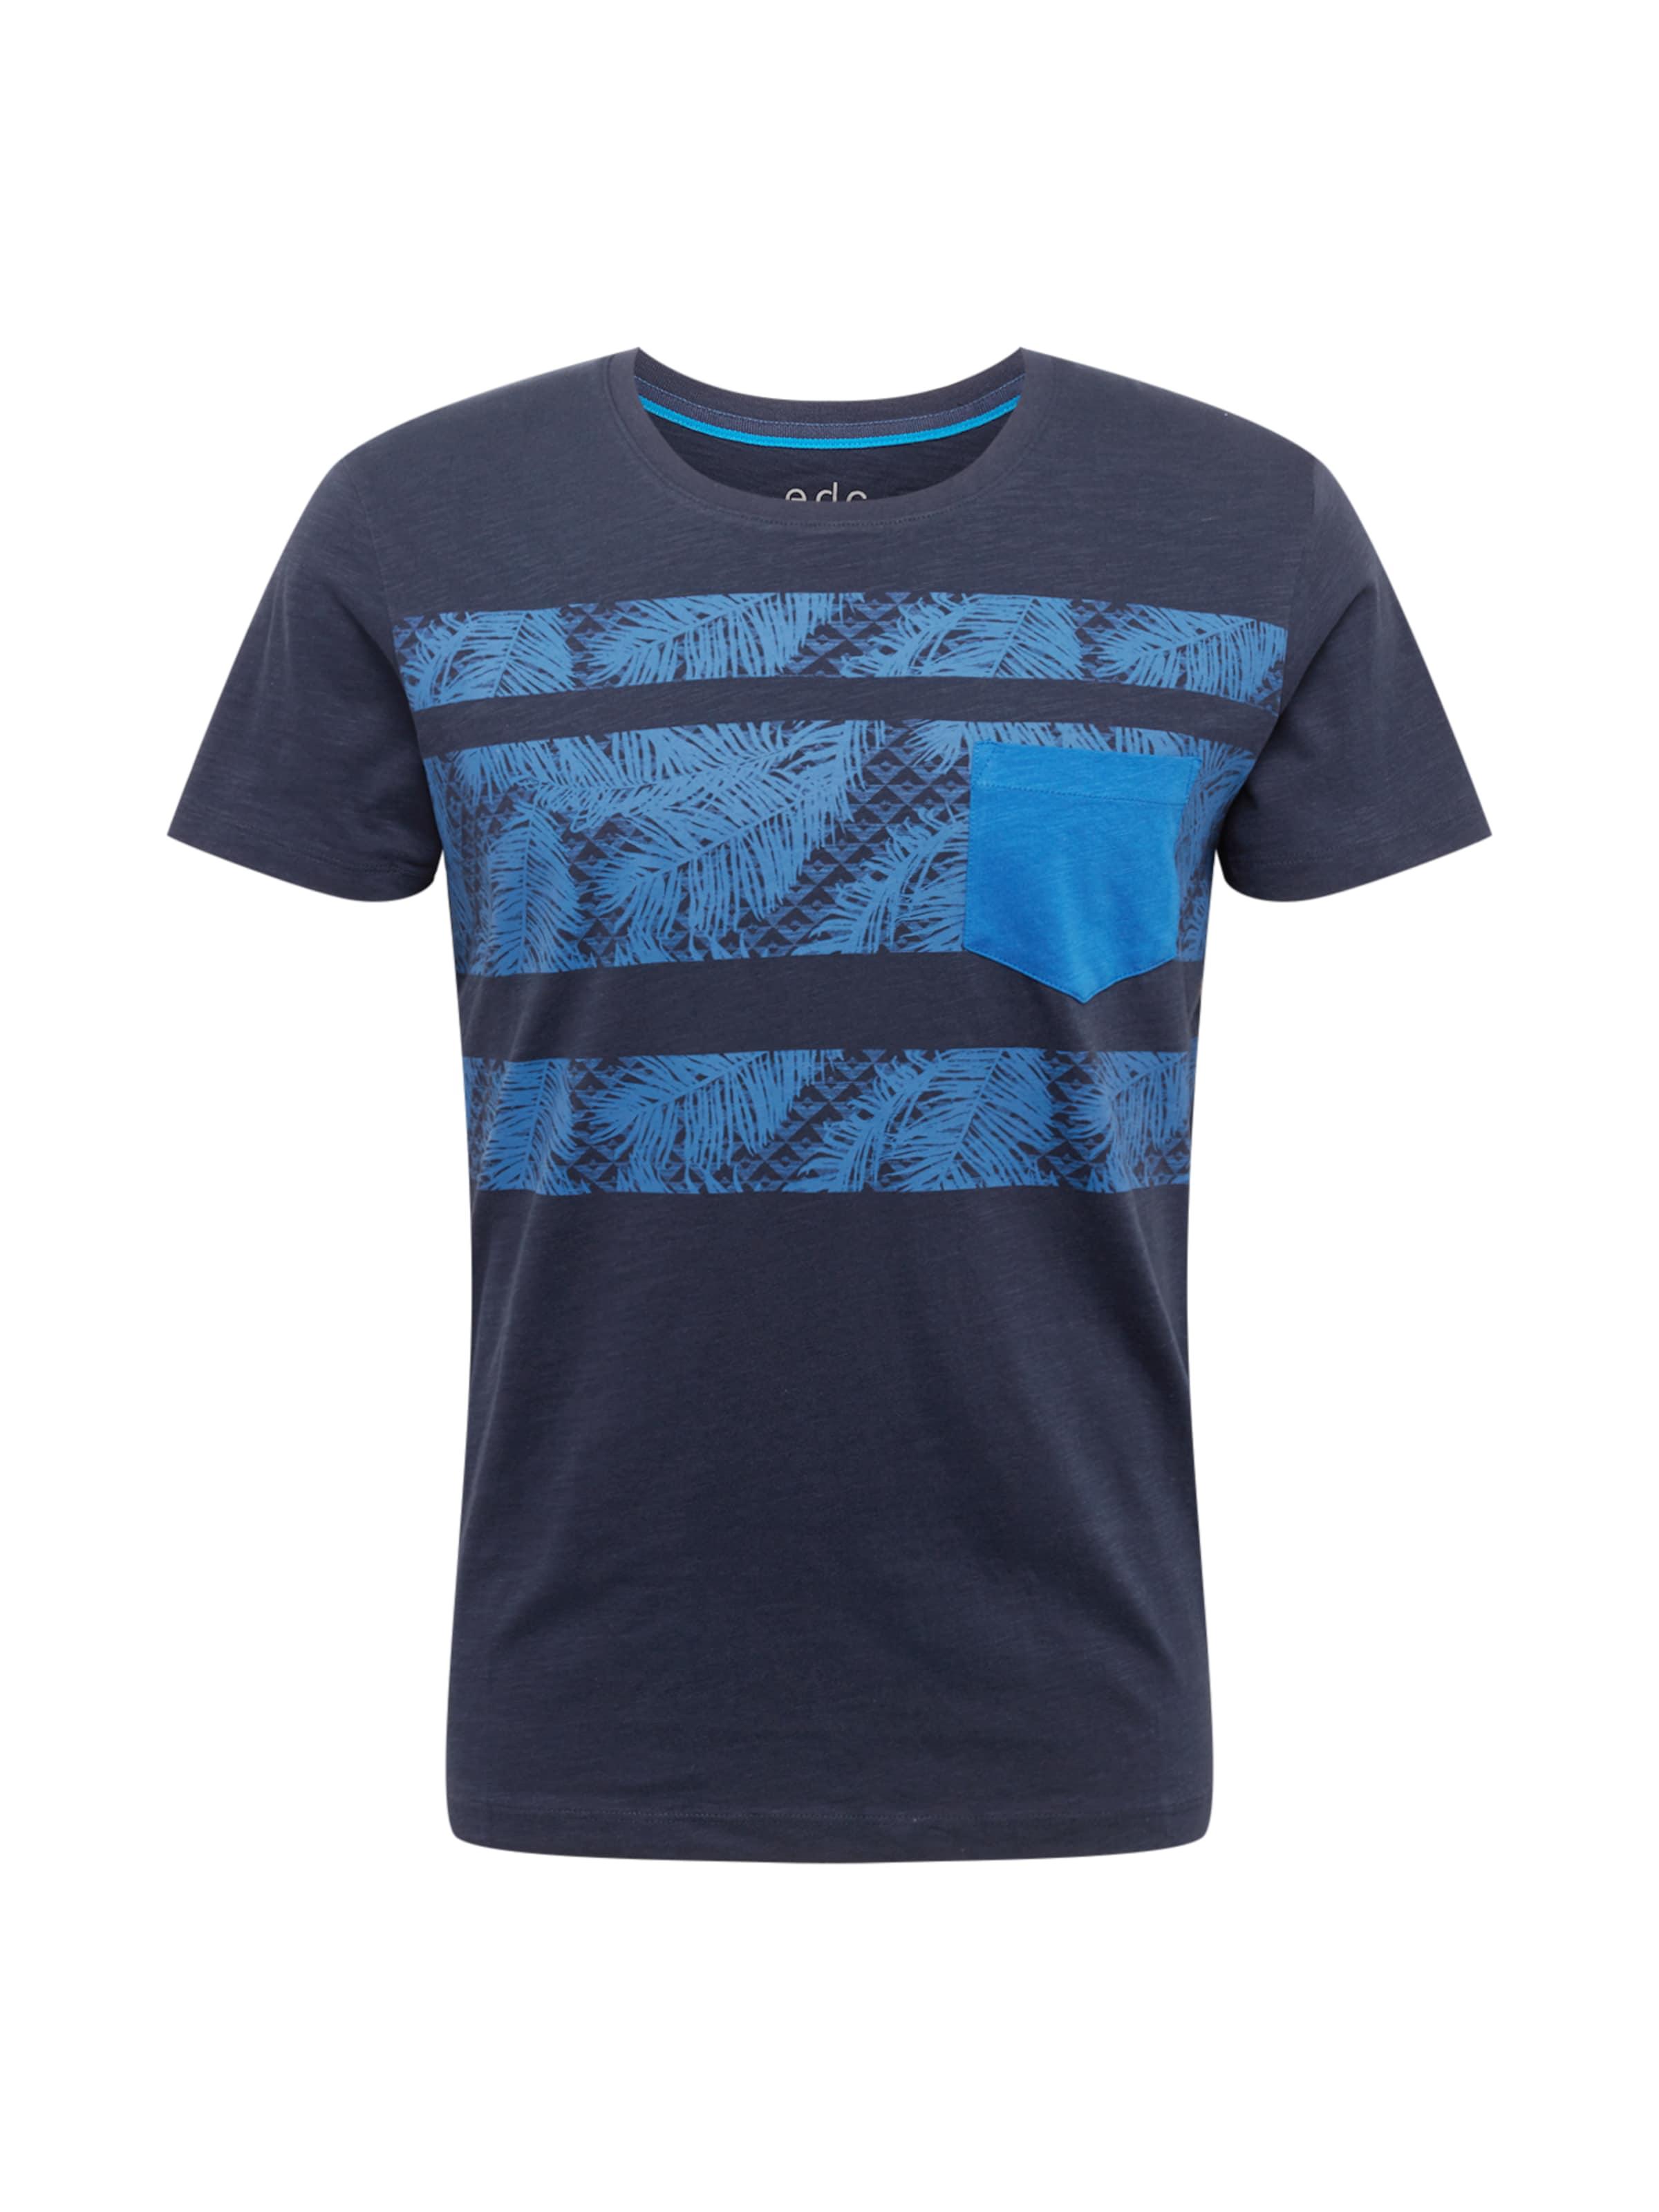 By Esprit Edc Bleu T shirt Marine En 4j35LARq